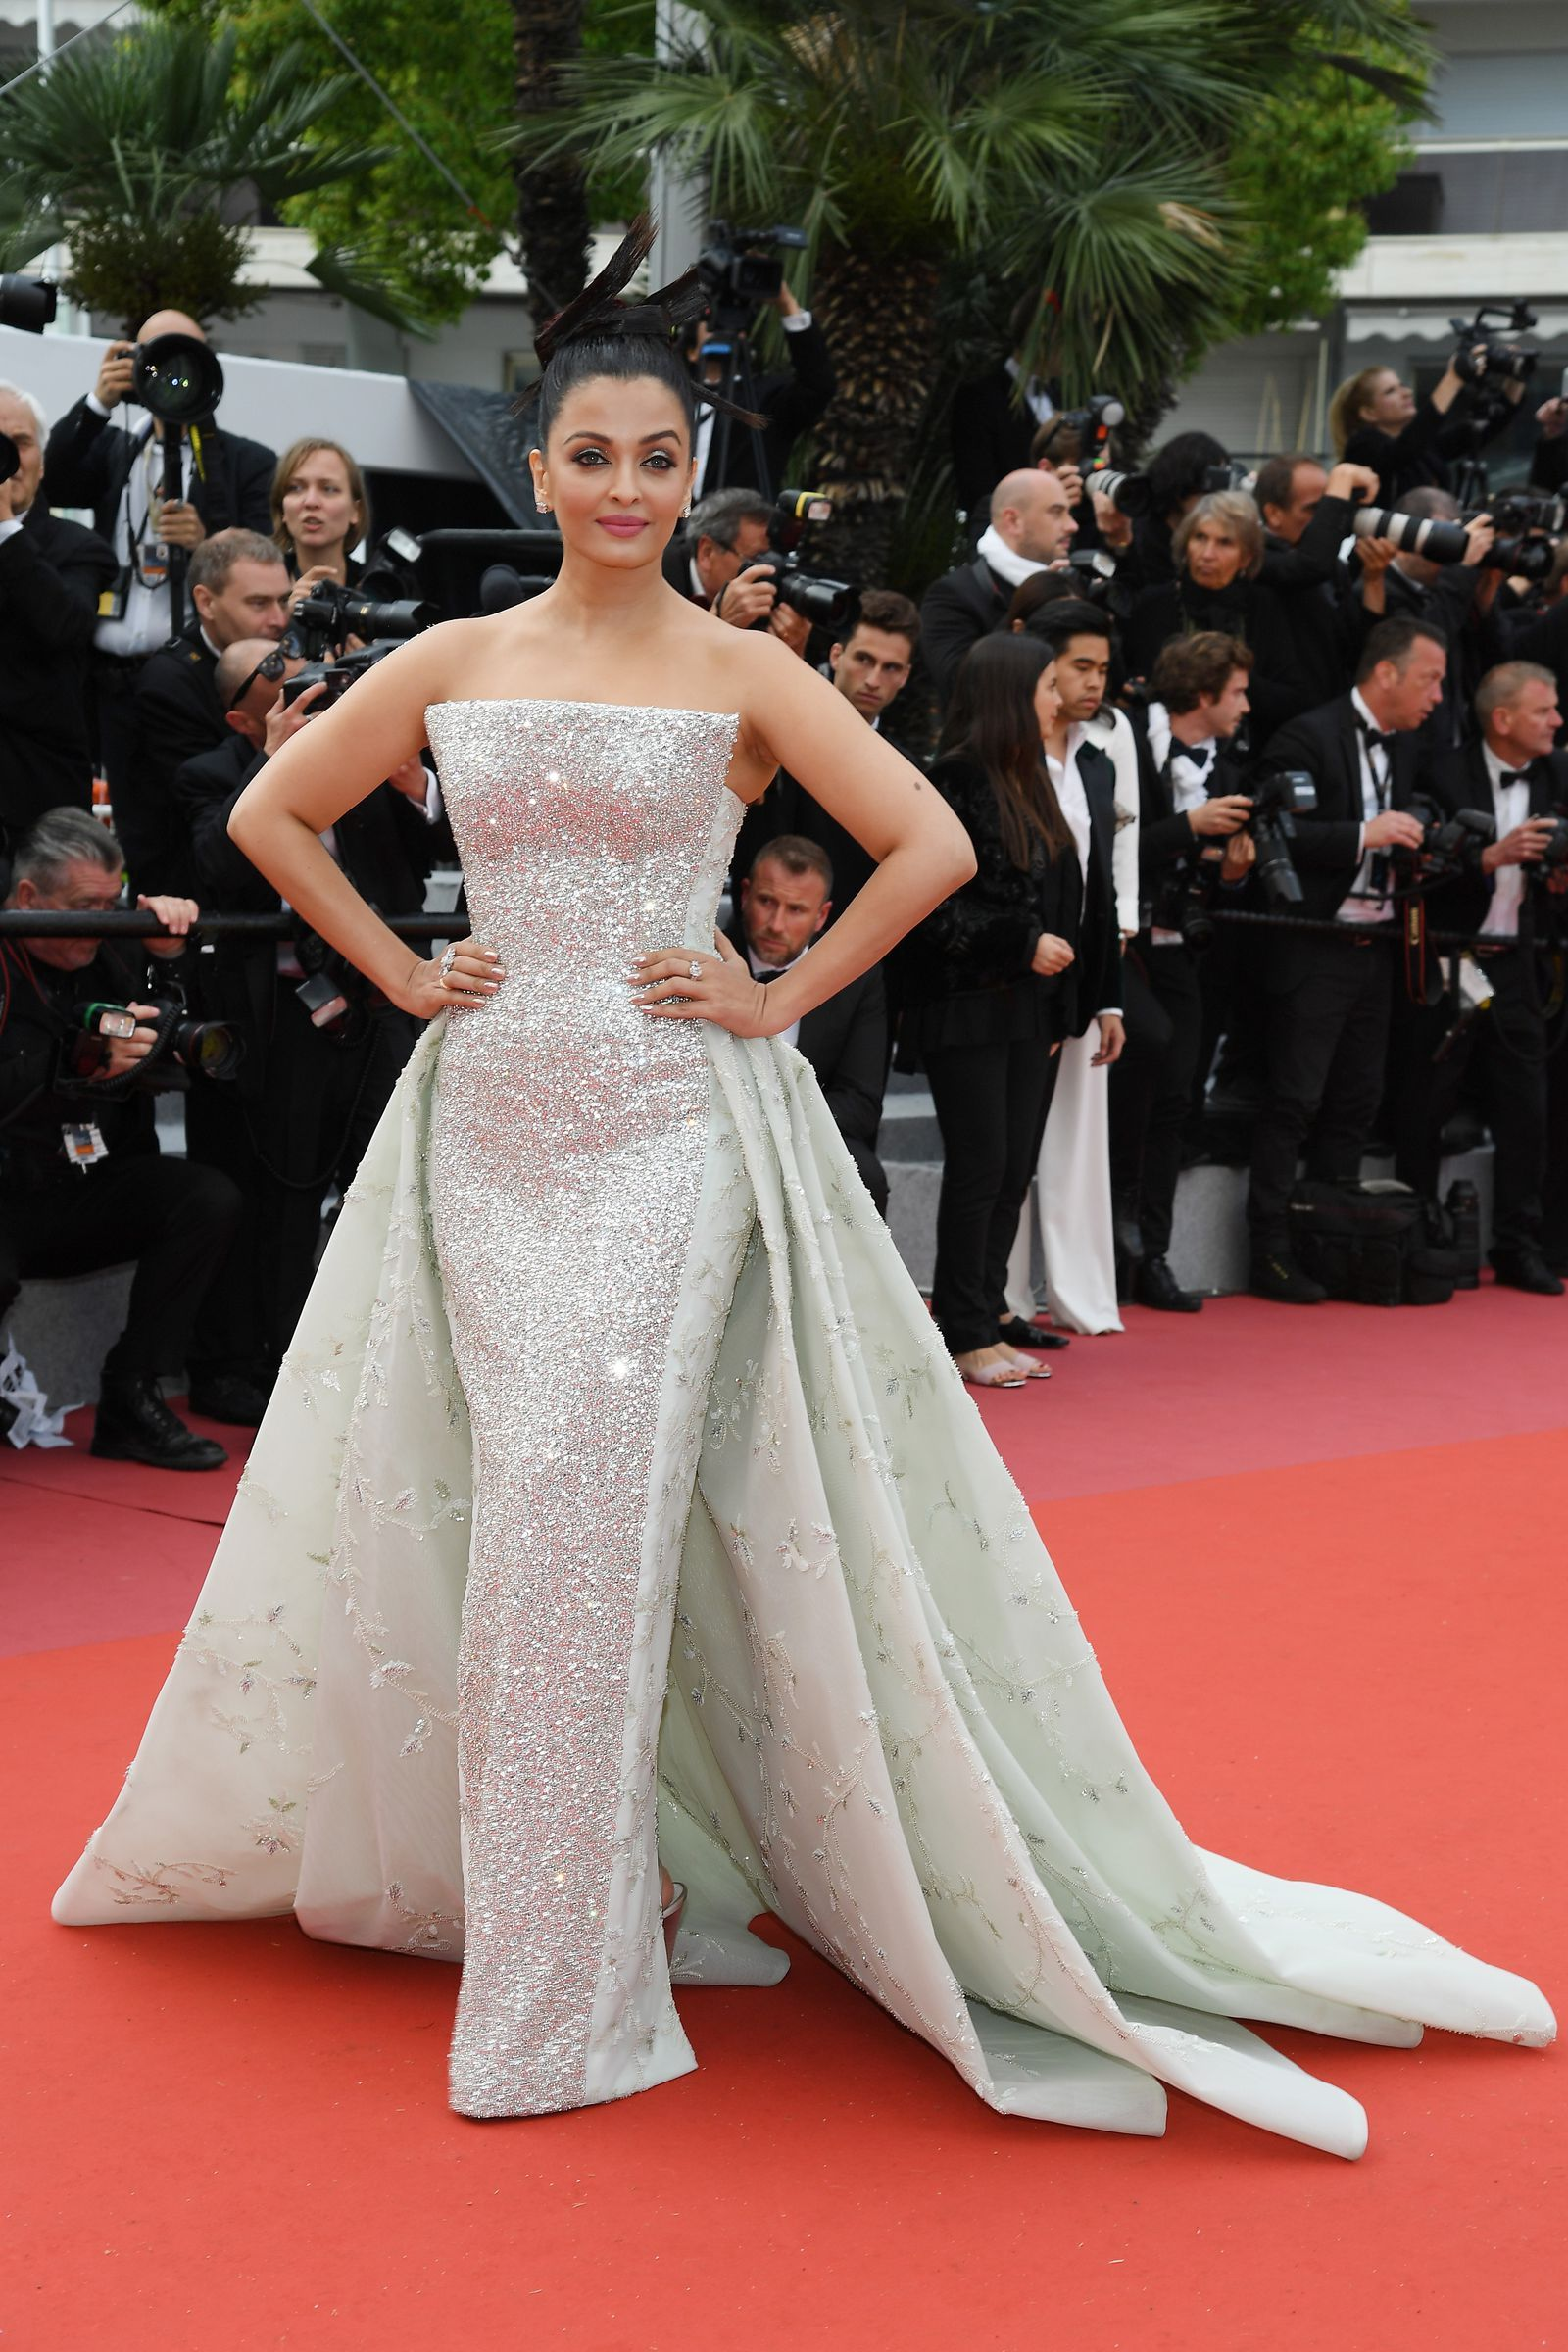 The Most Glamorous Looks At The Amfar Cannes Gala Red Carpet Dresses Celebrity Dresses Gala Dresses